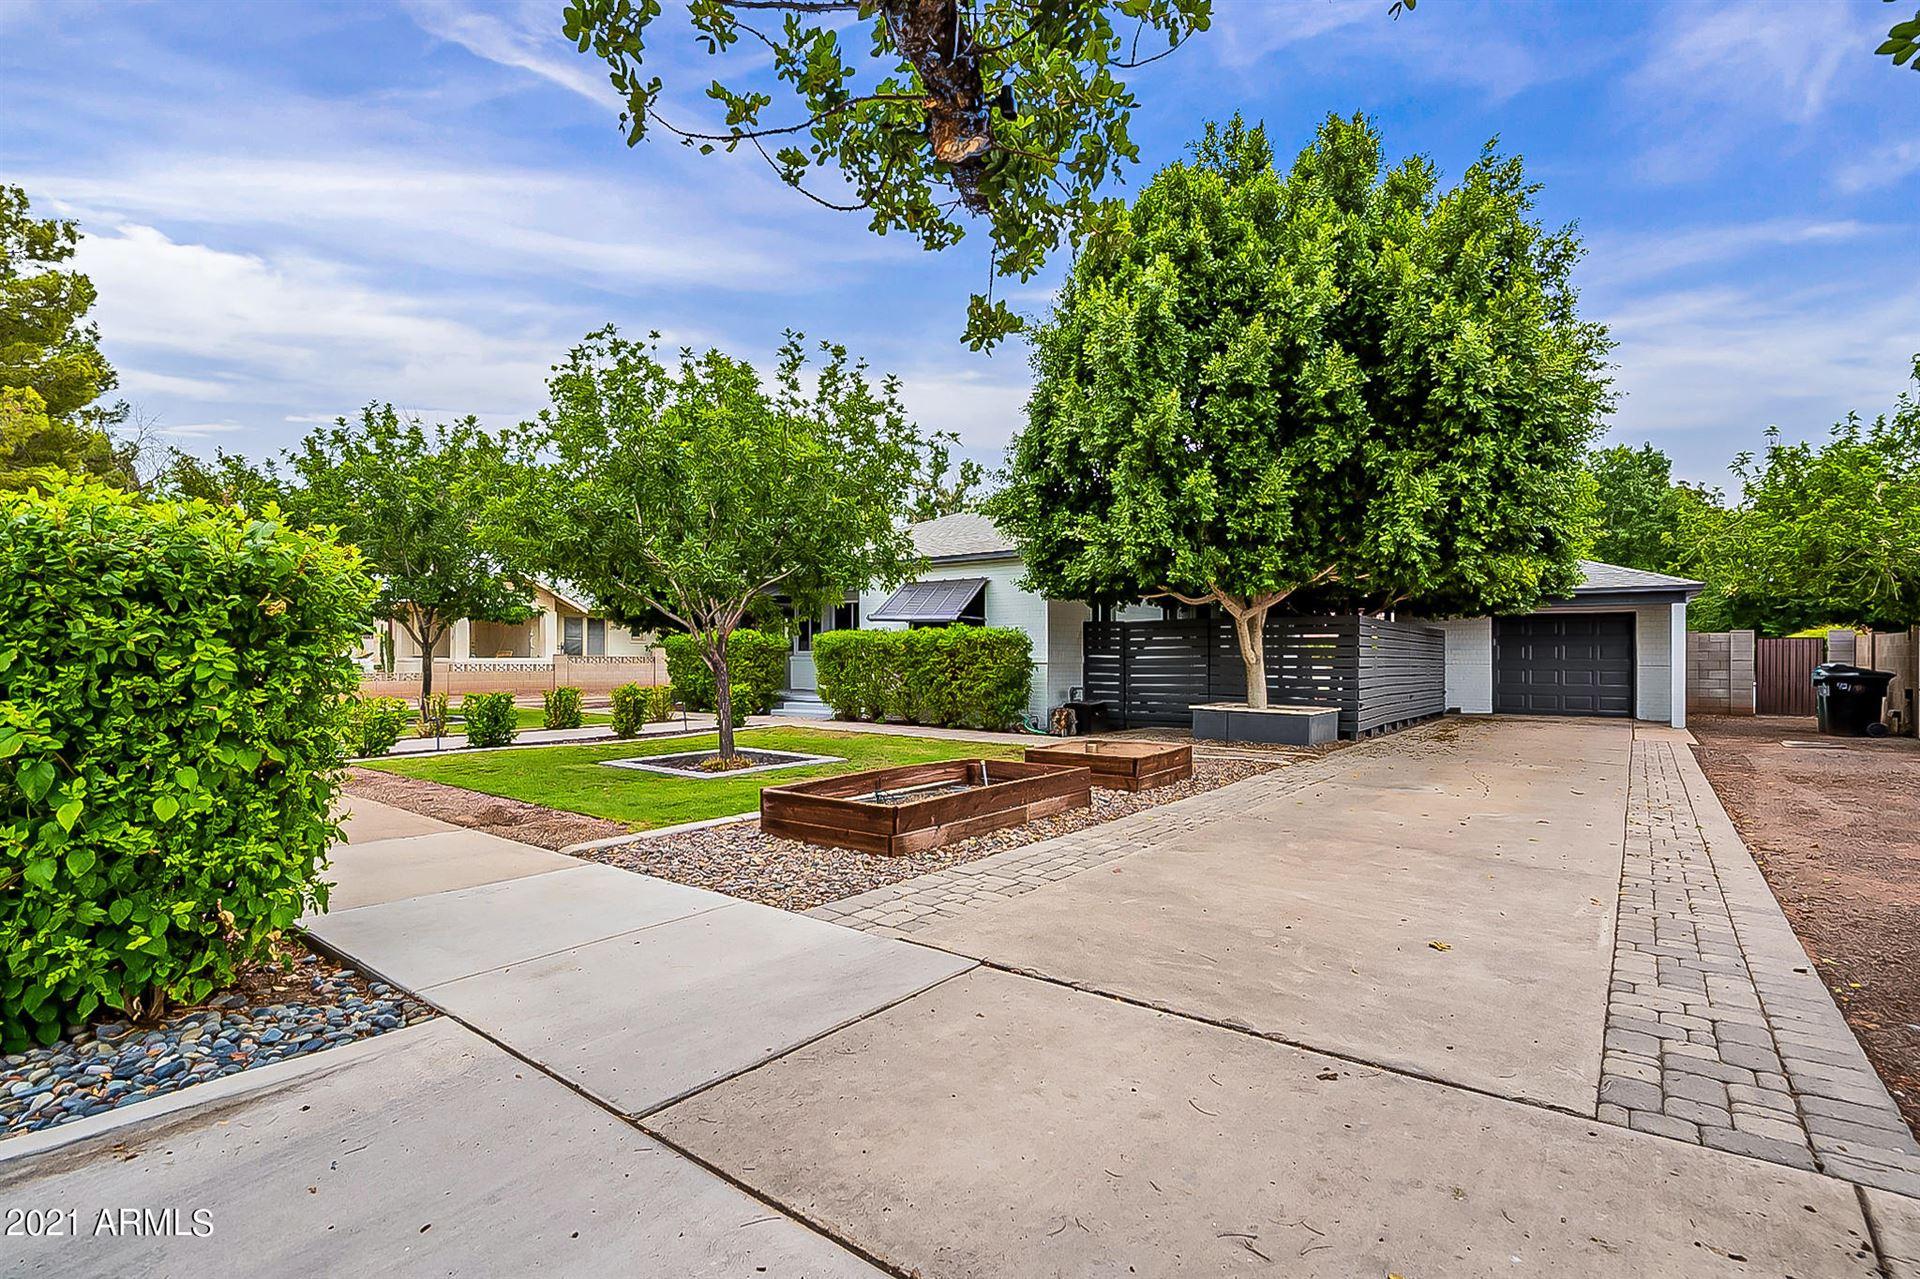 421 N GRAND --, Mesa, AZ 85201 - MLS#: 6261308